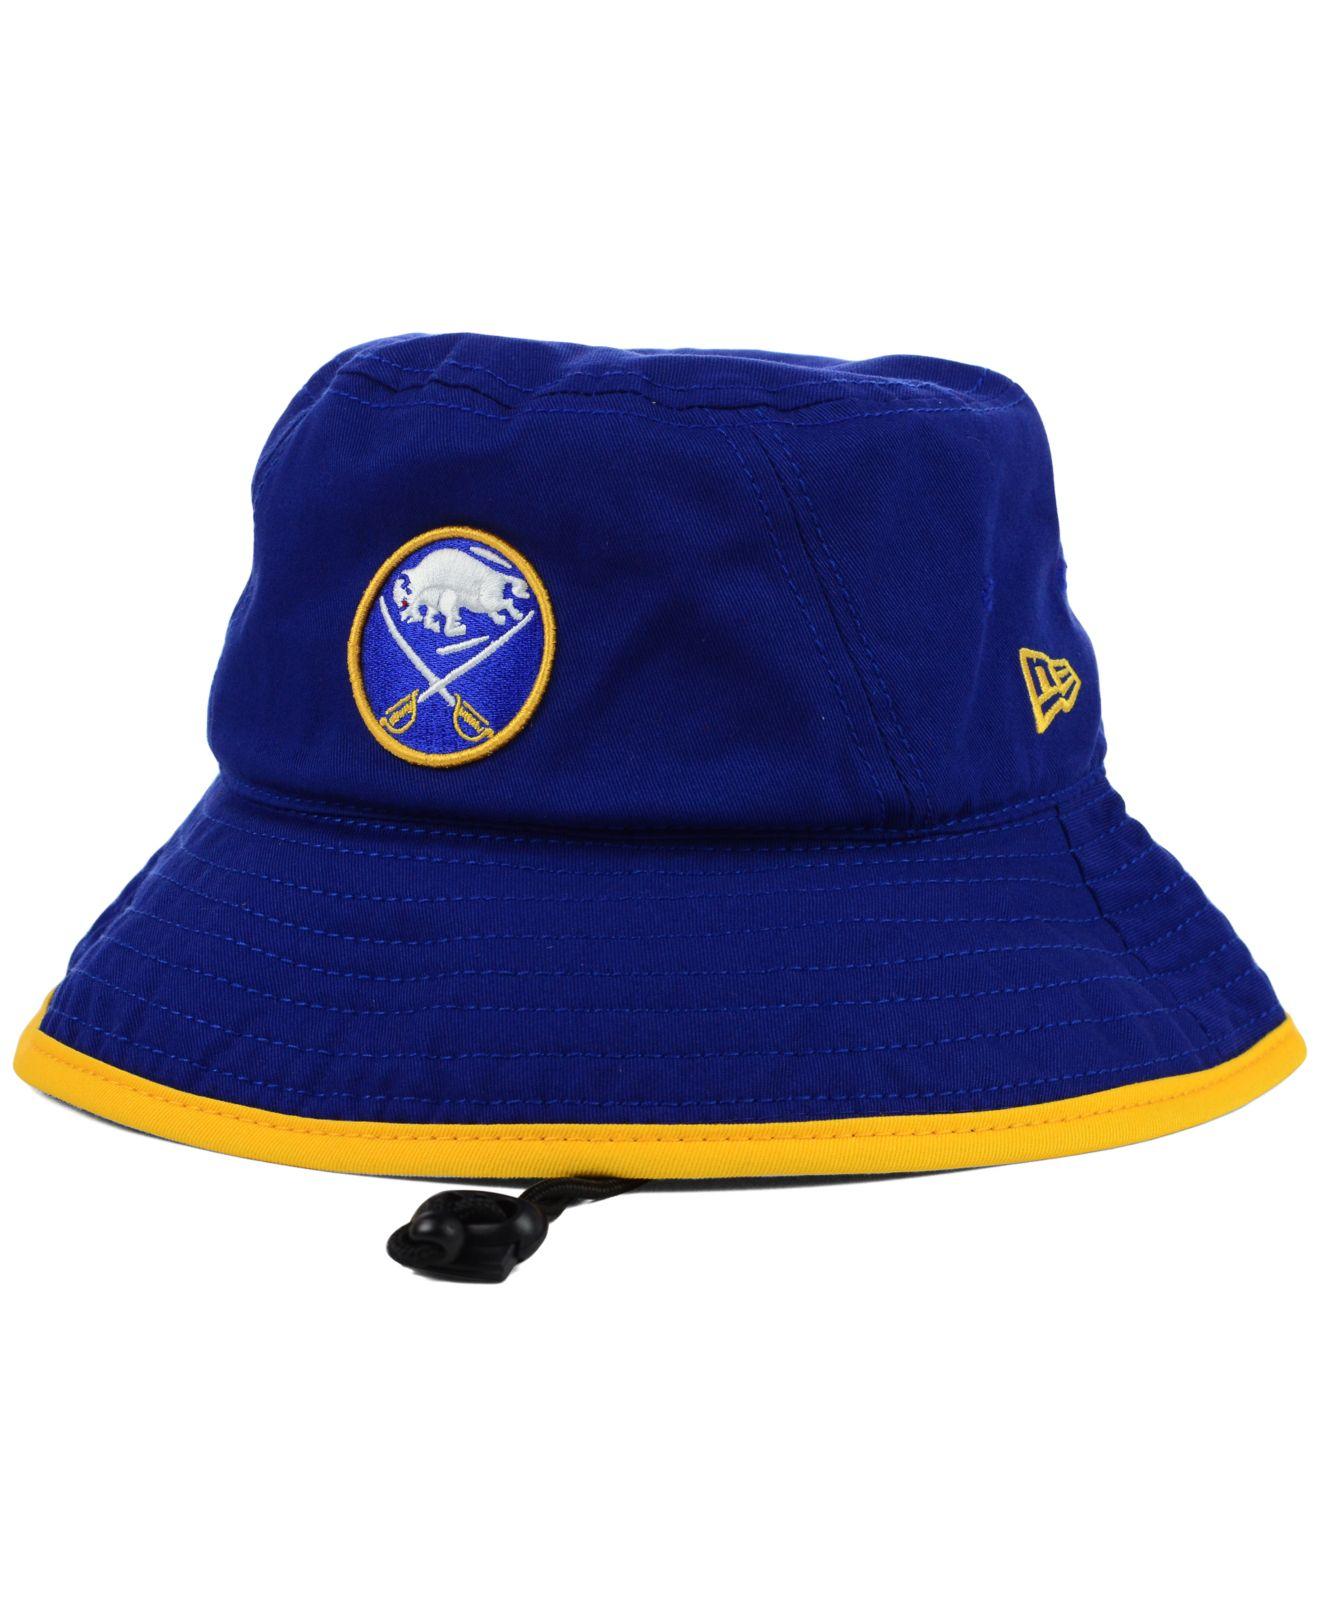 822ec33d13d Lyst - KTZ Buffalo Sabres Basic Tipped Bucket Hat in Blue for Men